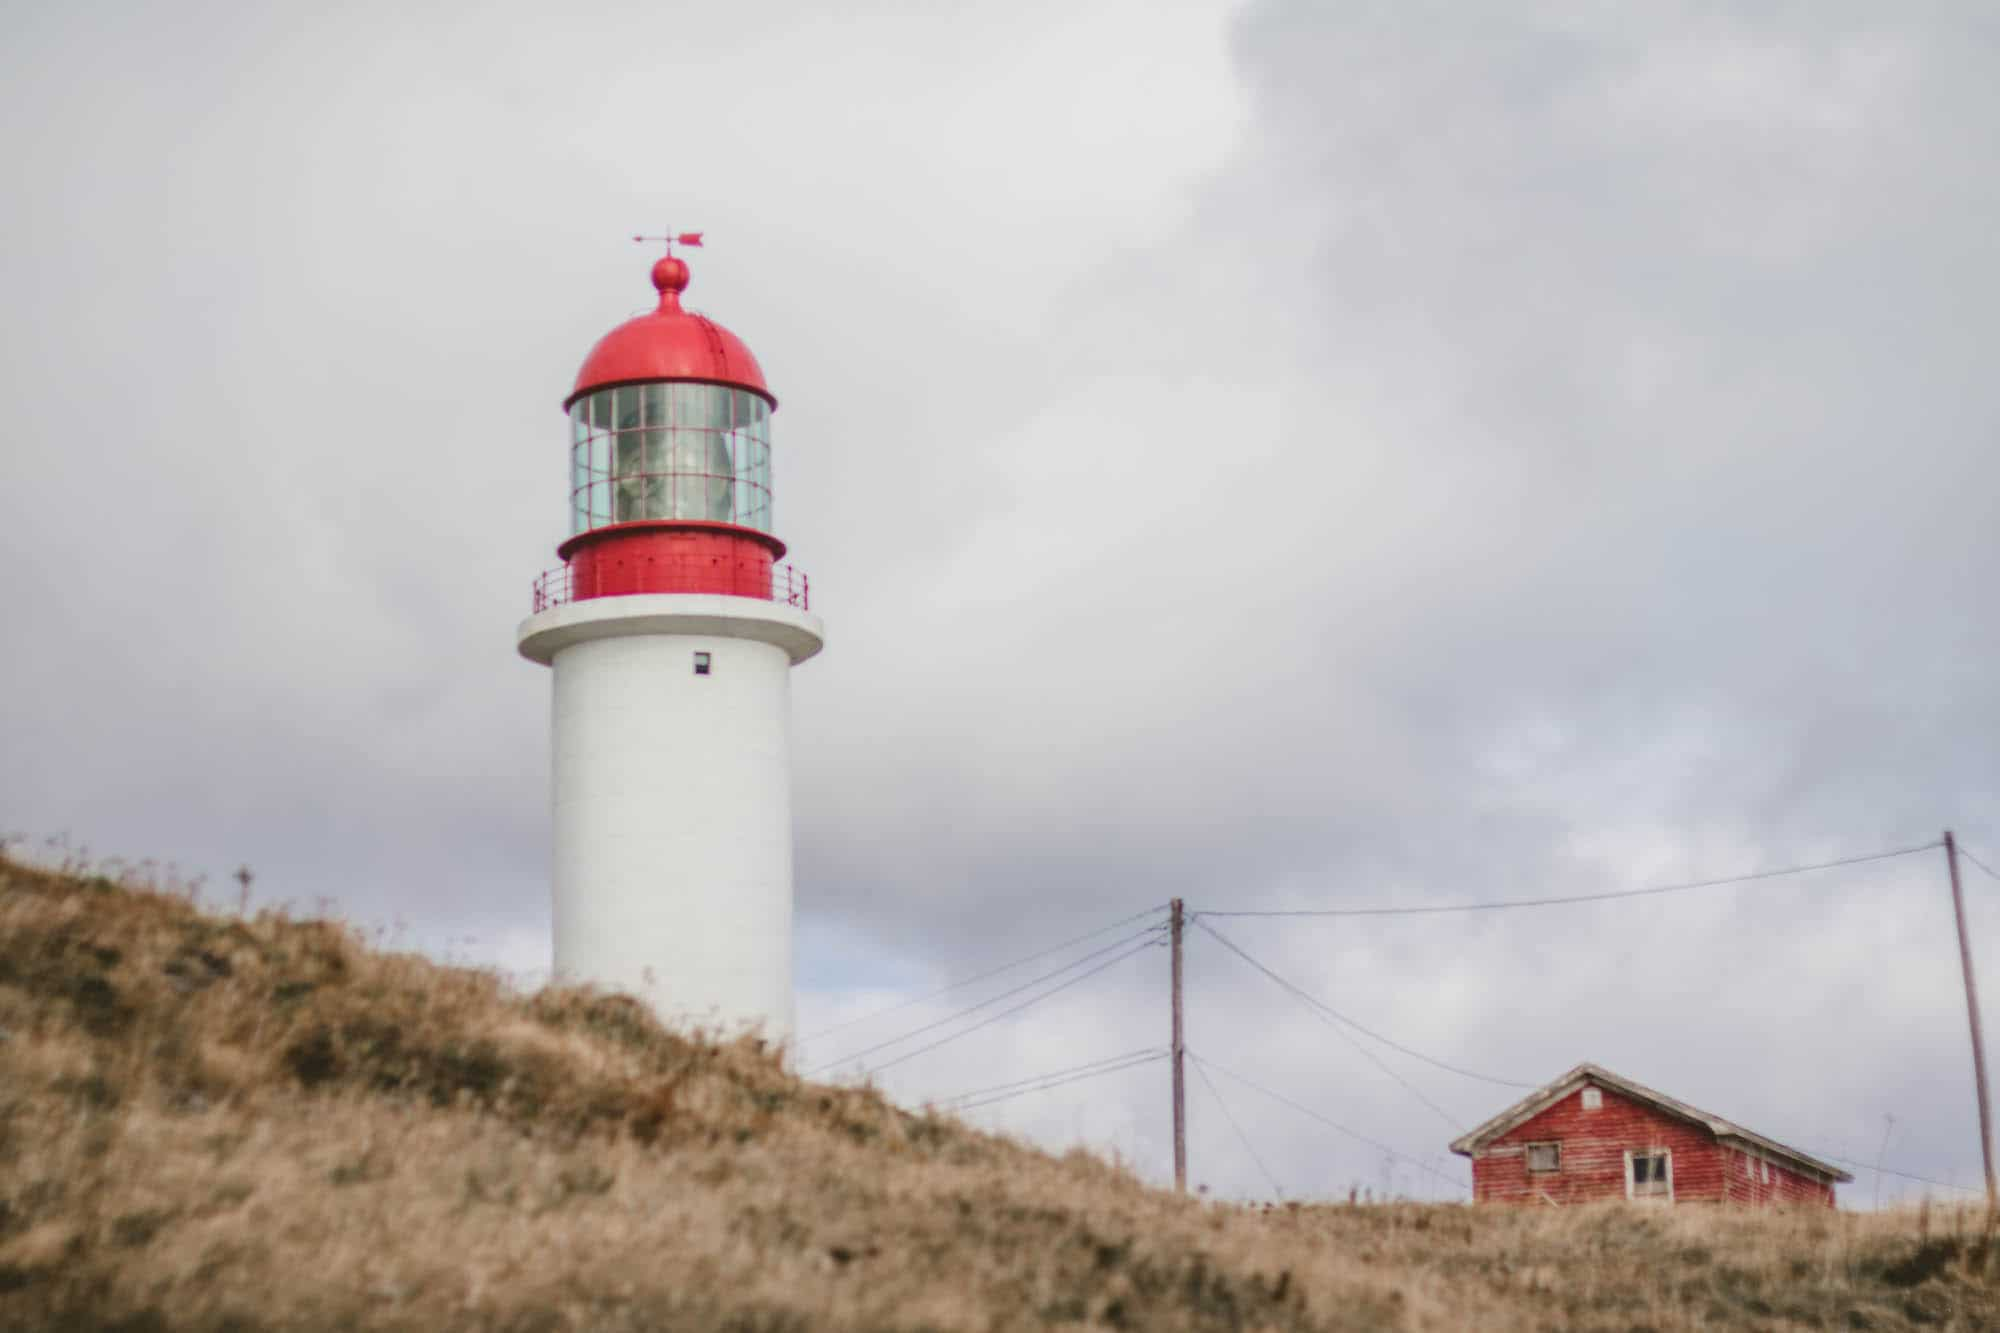 Cape Race Lighthouse in St. John's, Newfoundland